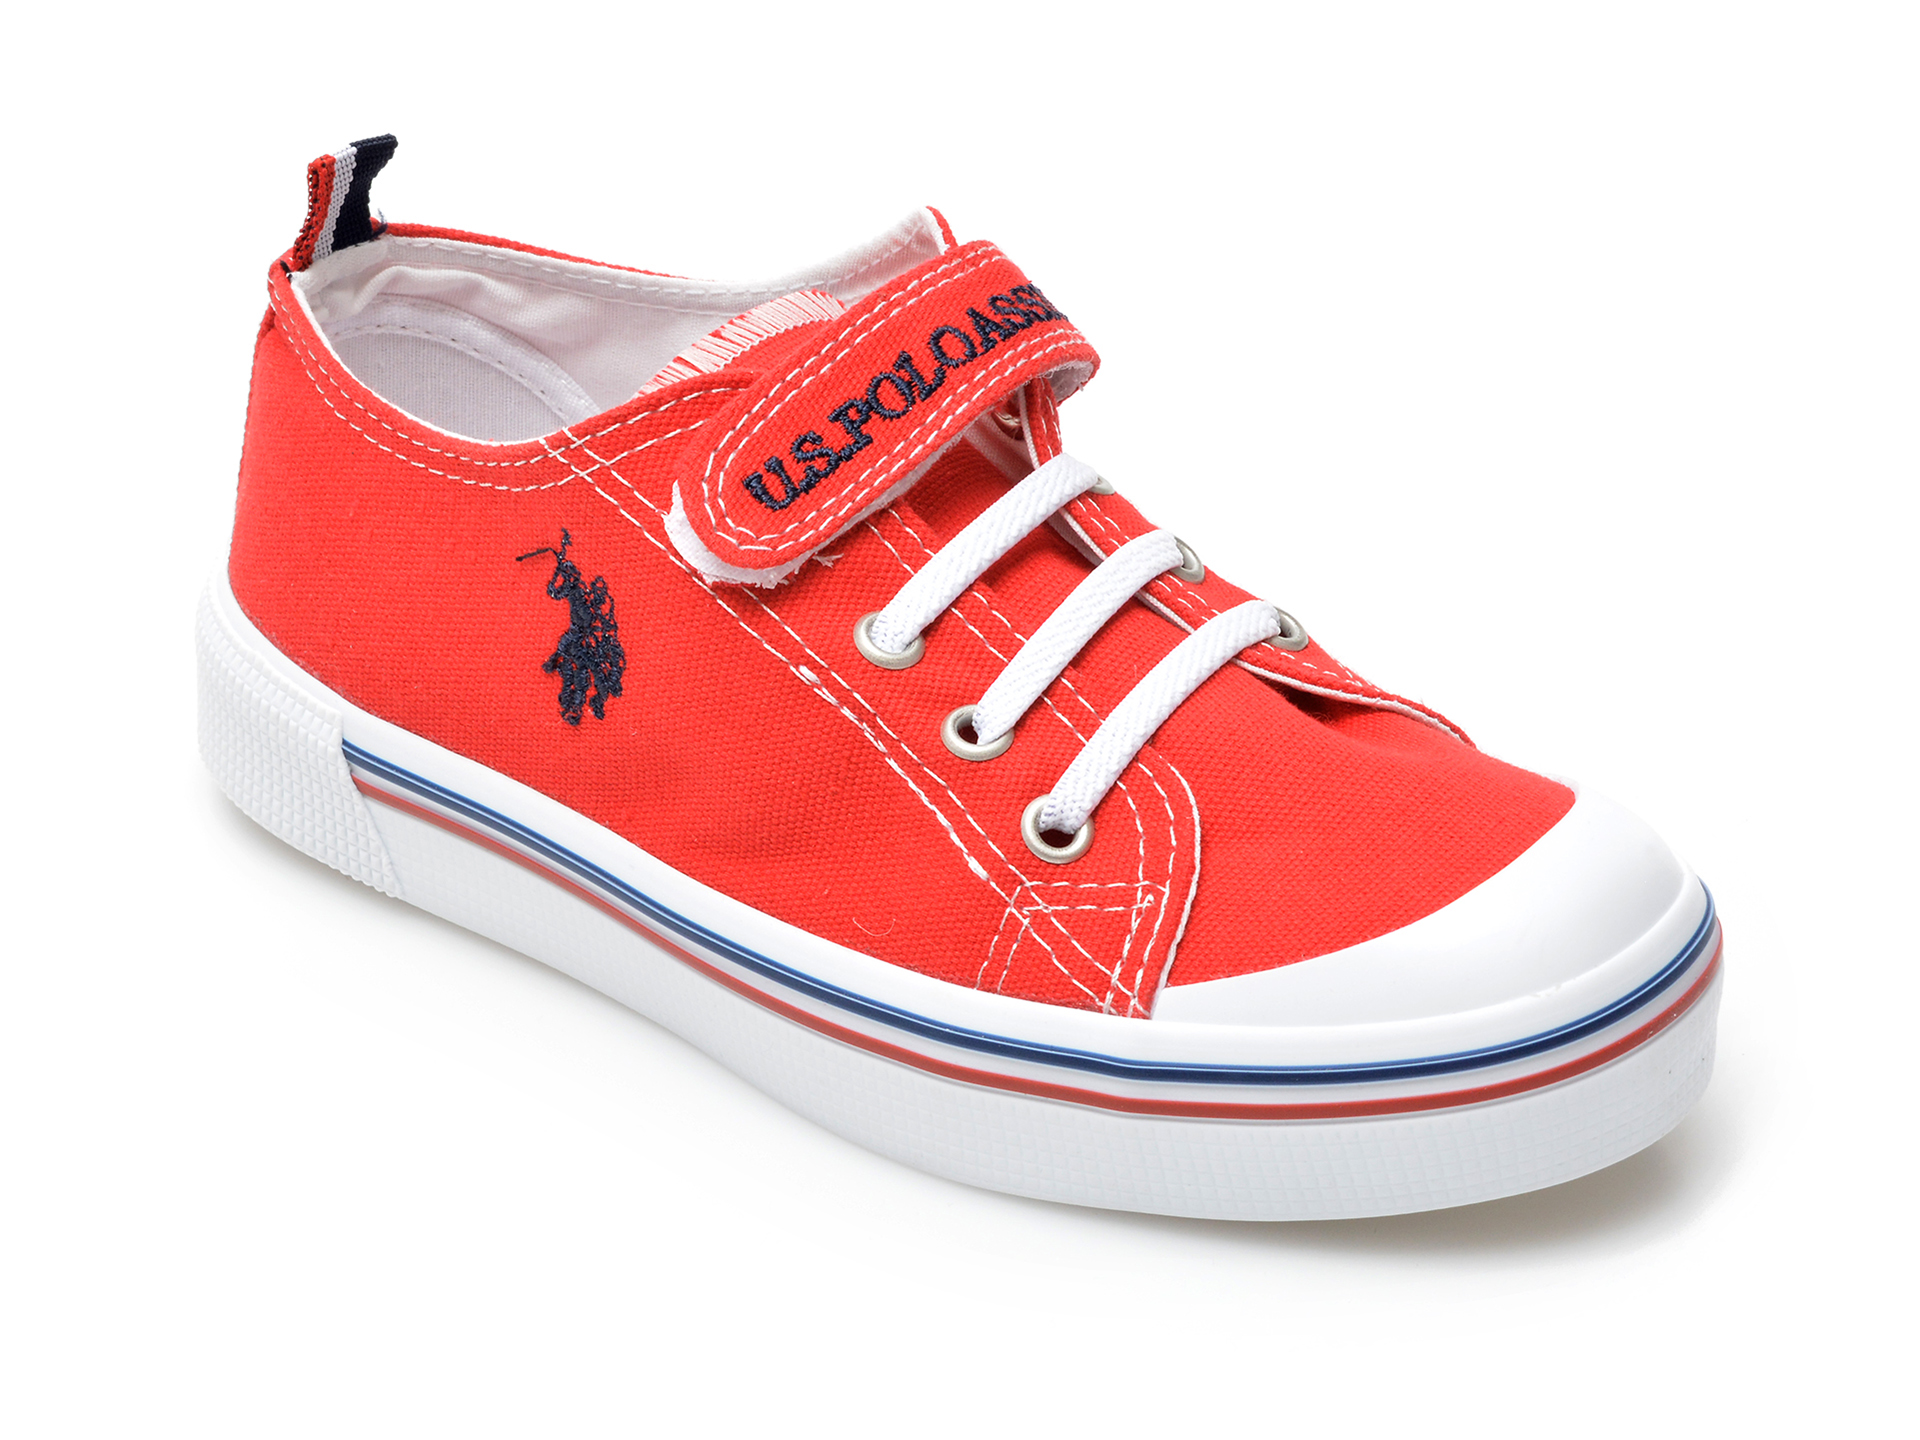 Pantofi US POLO ASSN rosii, MICK1FX, din material textil